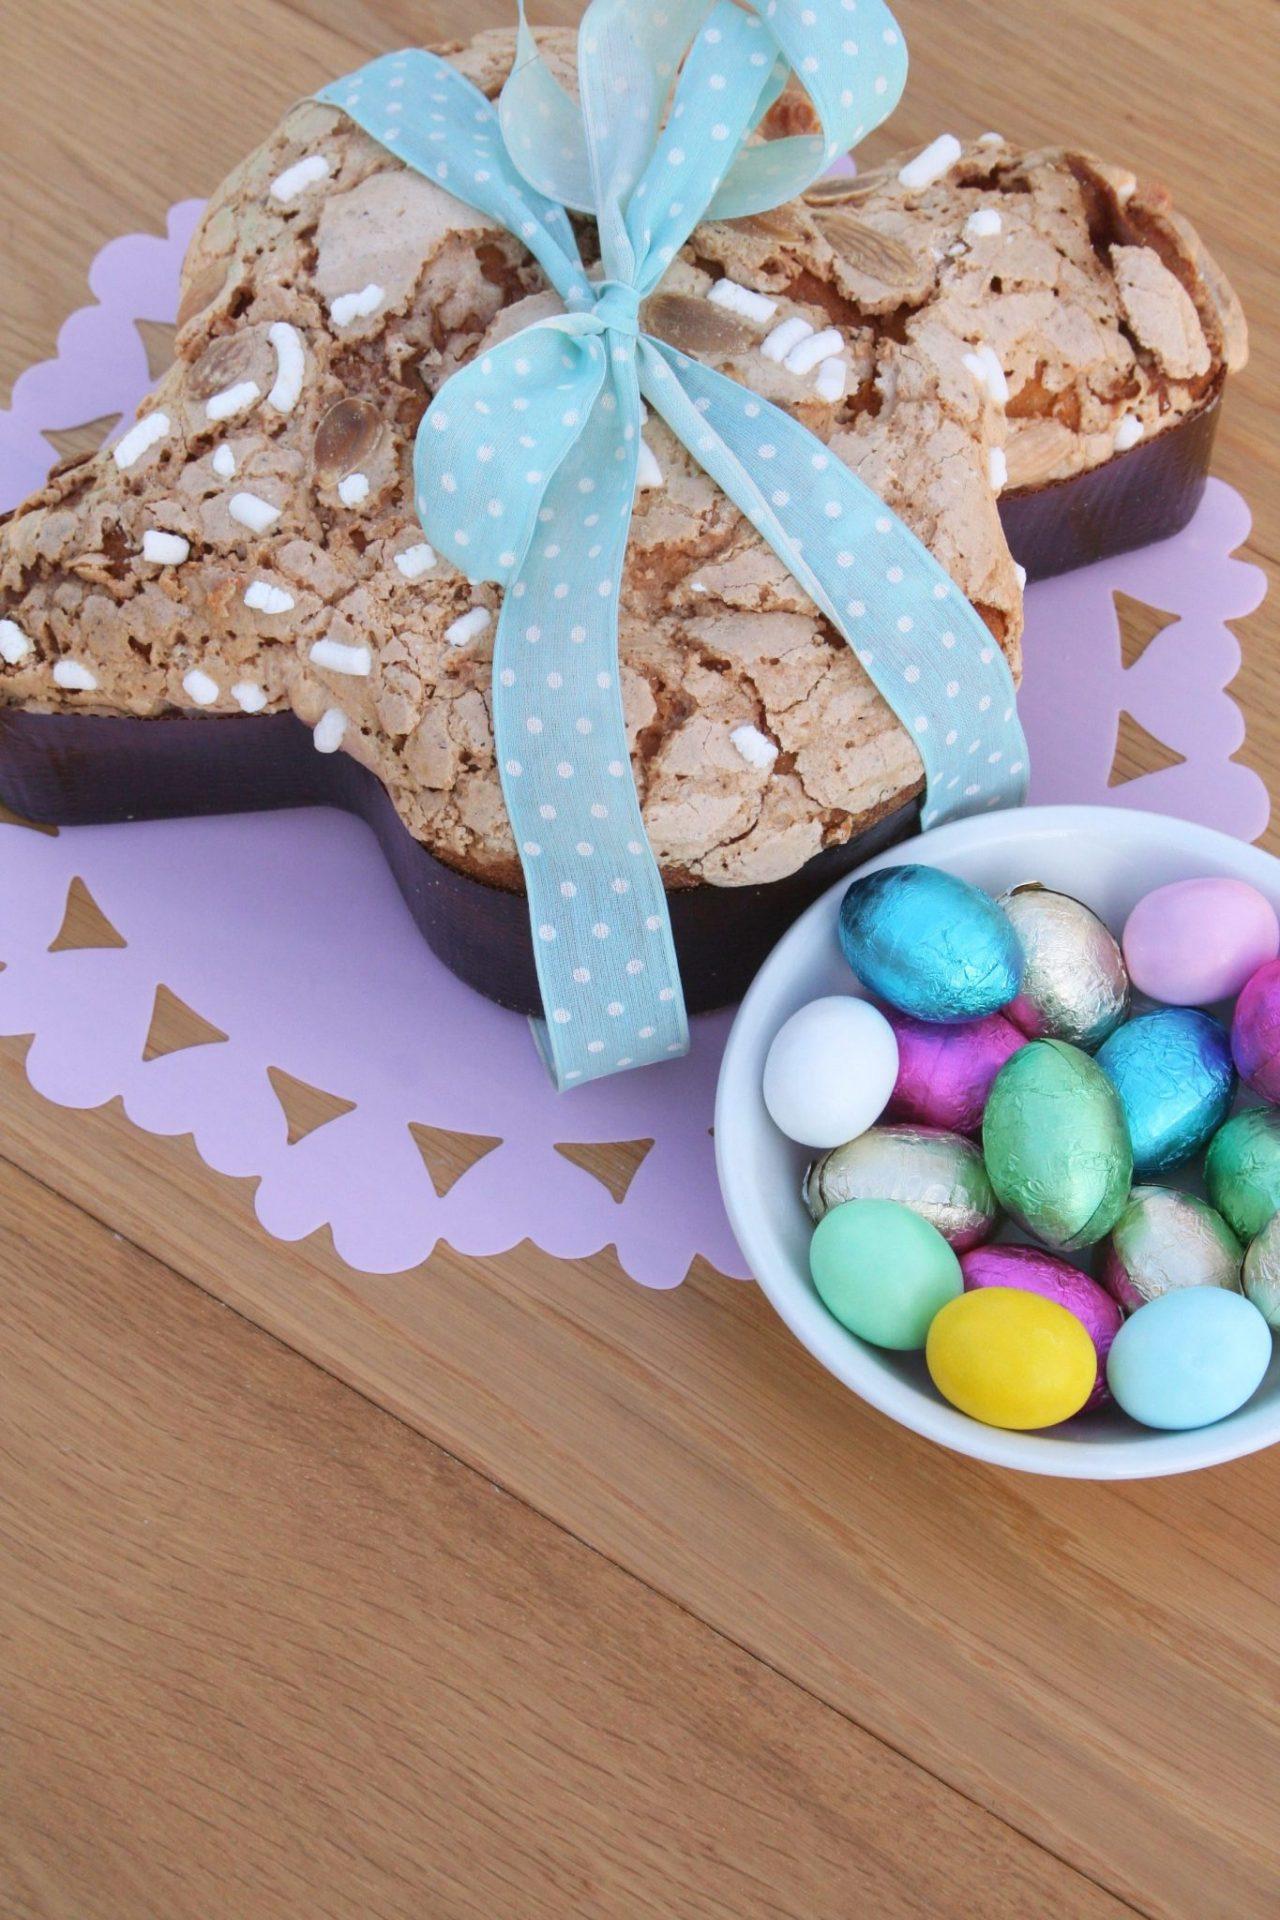 docesparapascoacolombaglutenfree scaled - Além do ovo de chocolate: dicas de doces para páscoa para surpreender e encantar